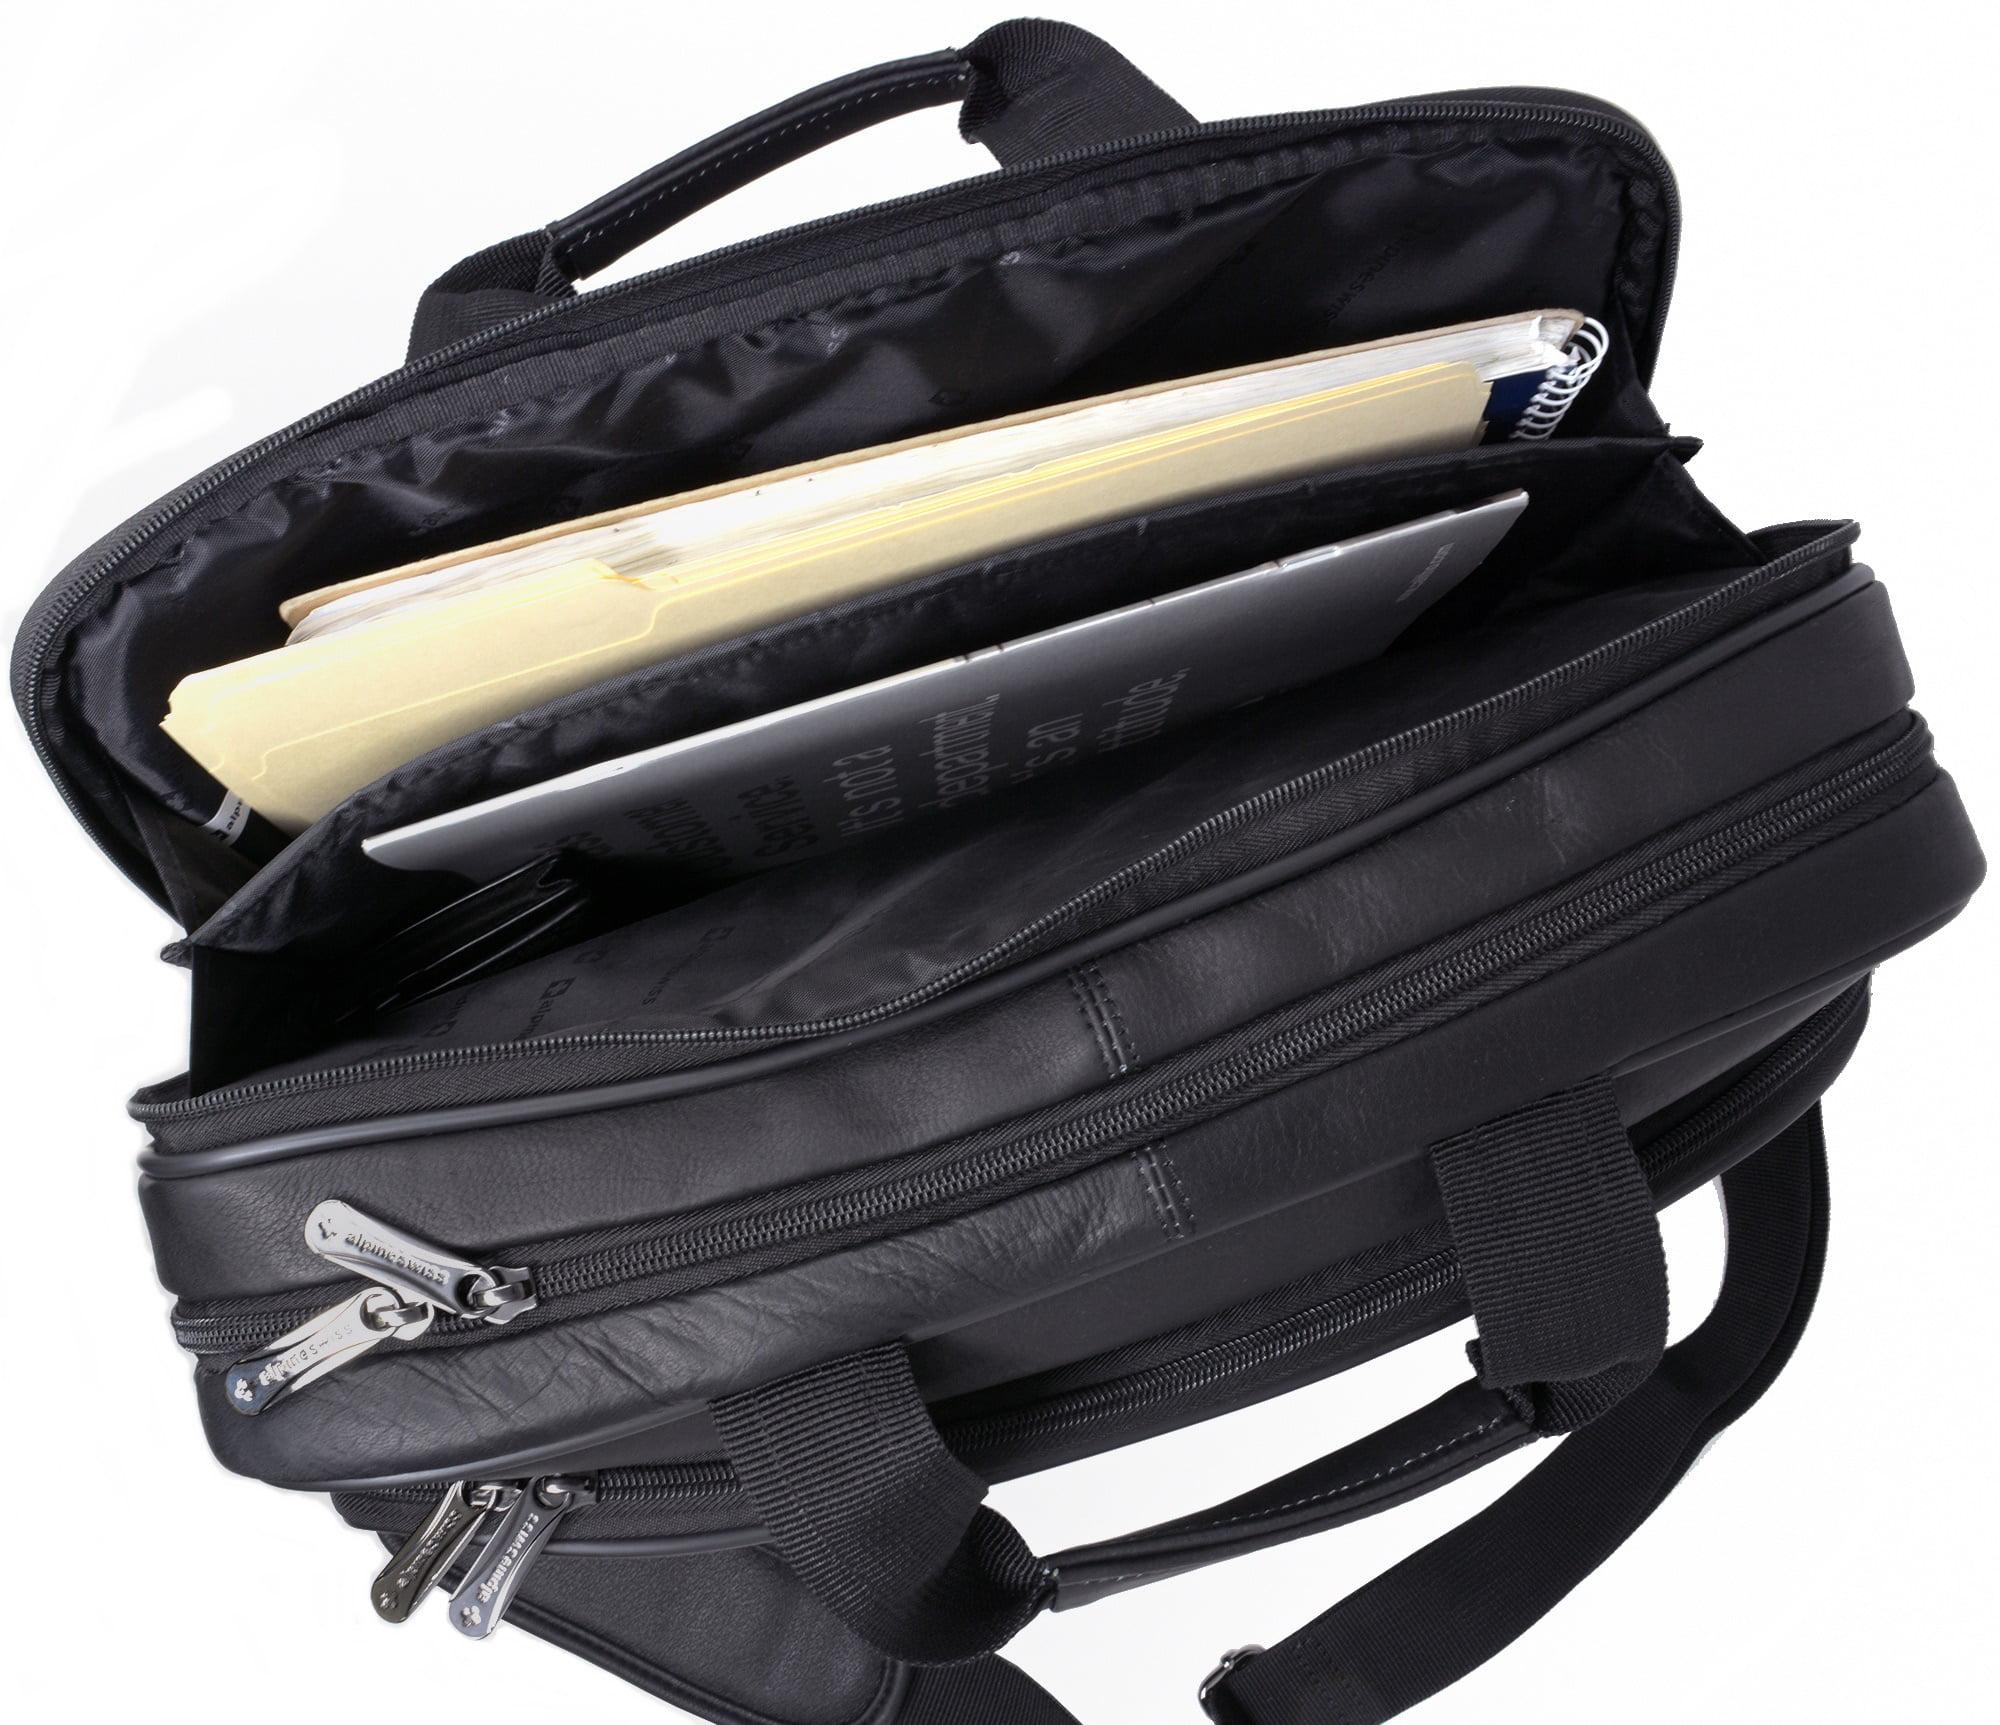 42e9bdedb Alpine Swiss - Alpine Swiss Messenger Bag Leather 15.6 Laptop Briefcase  Portfolio Business Case - Walmart.com